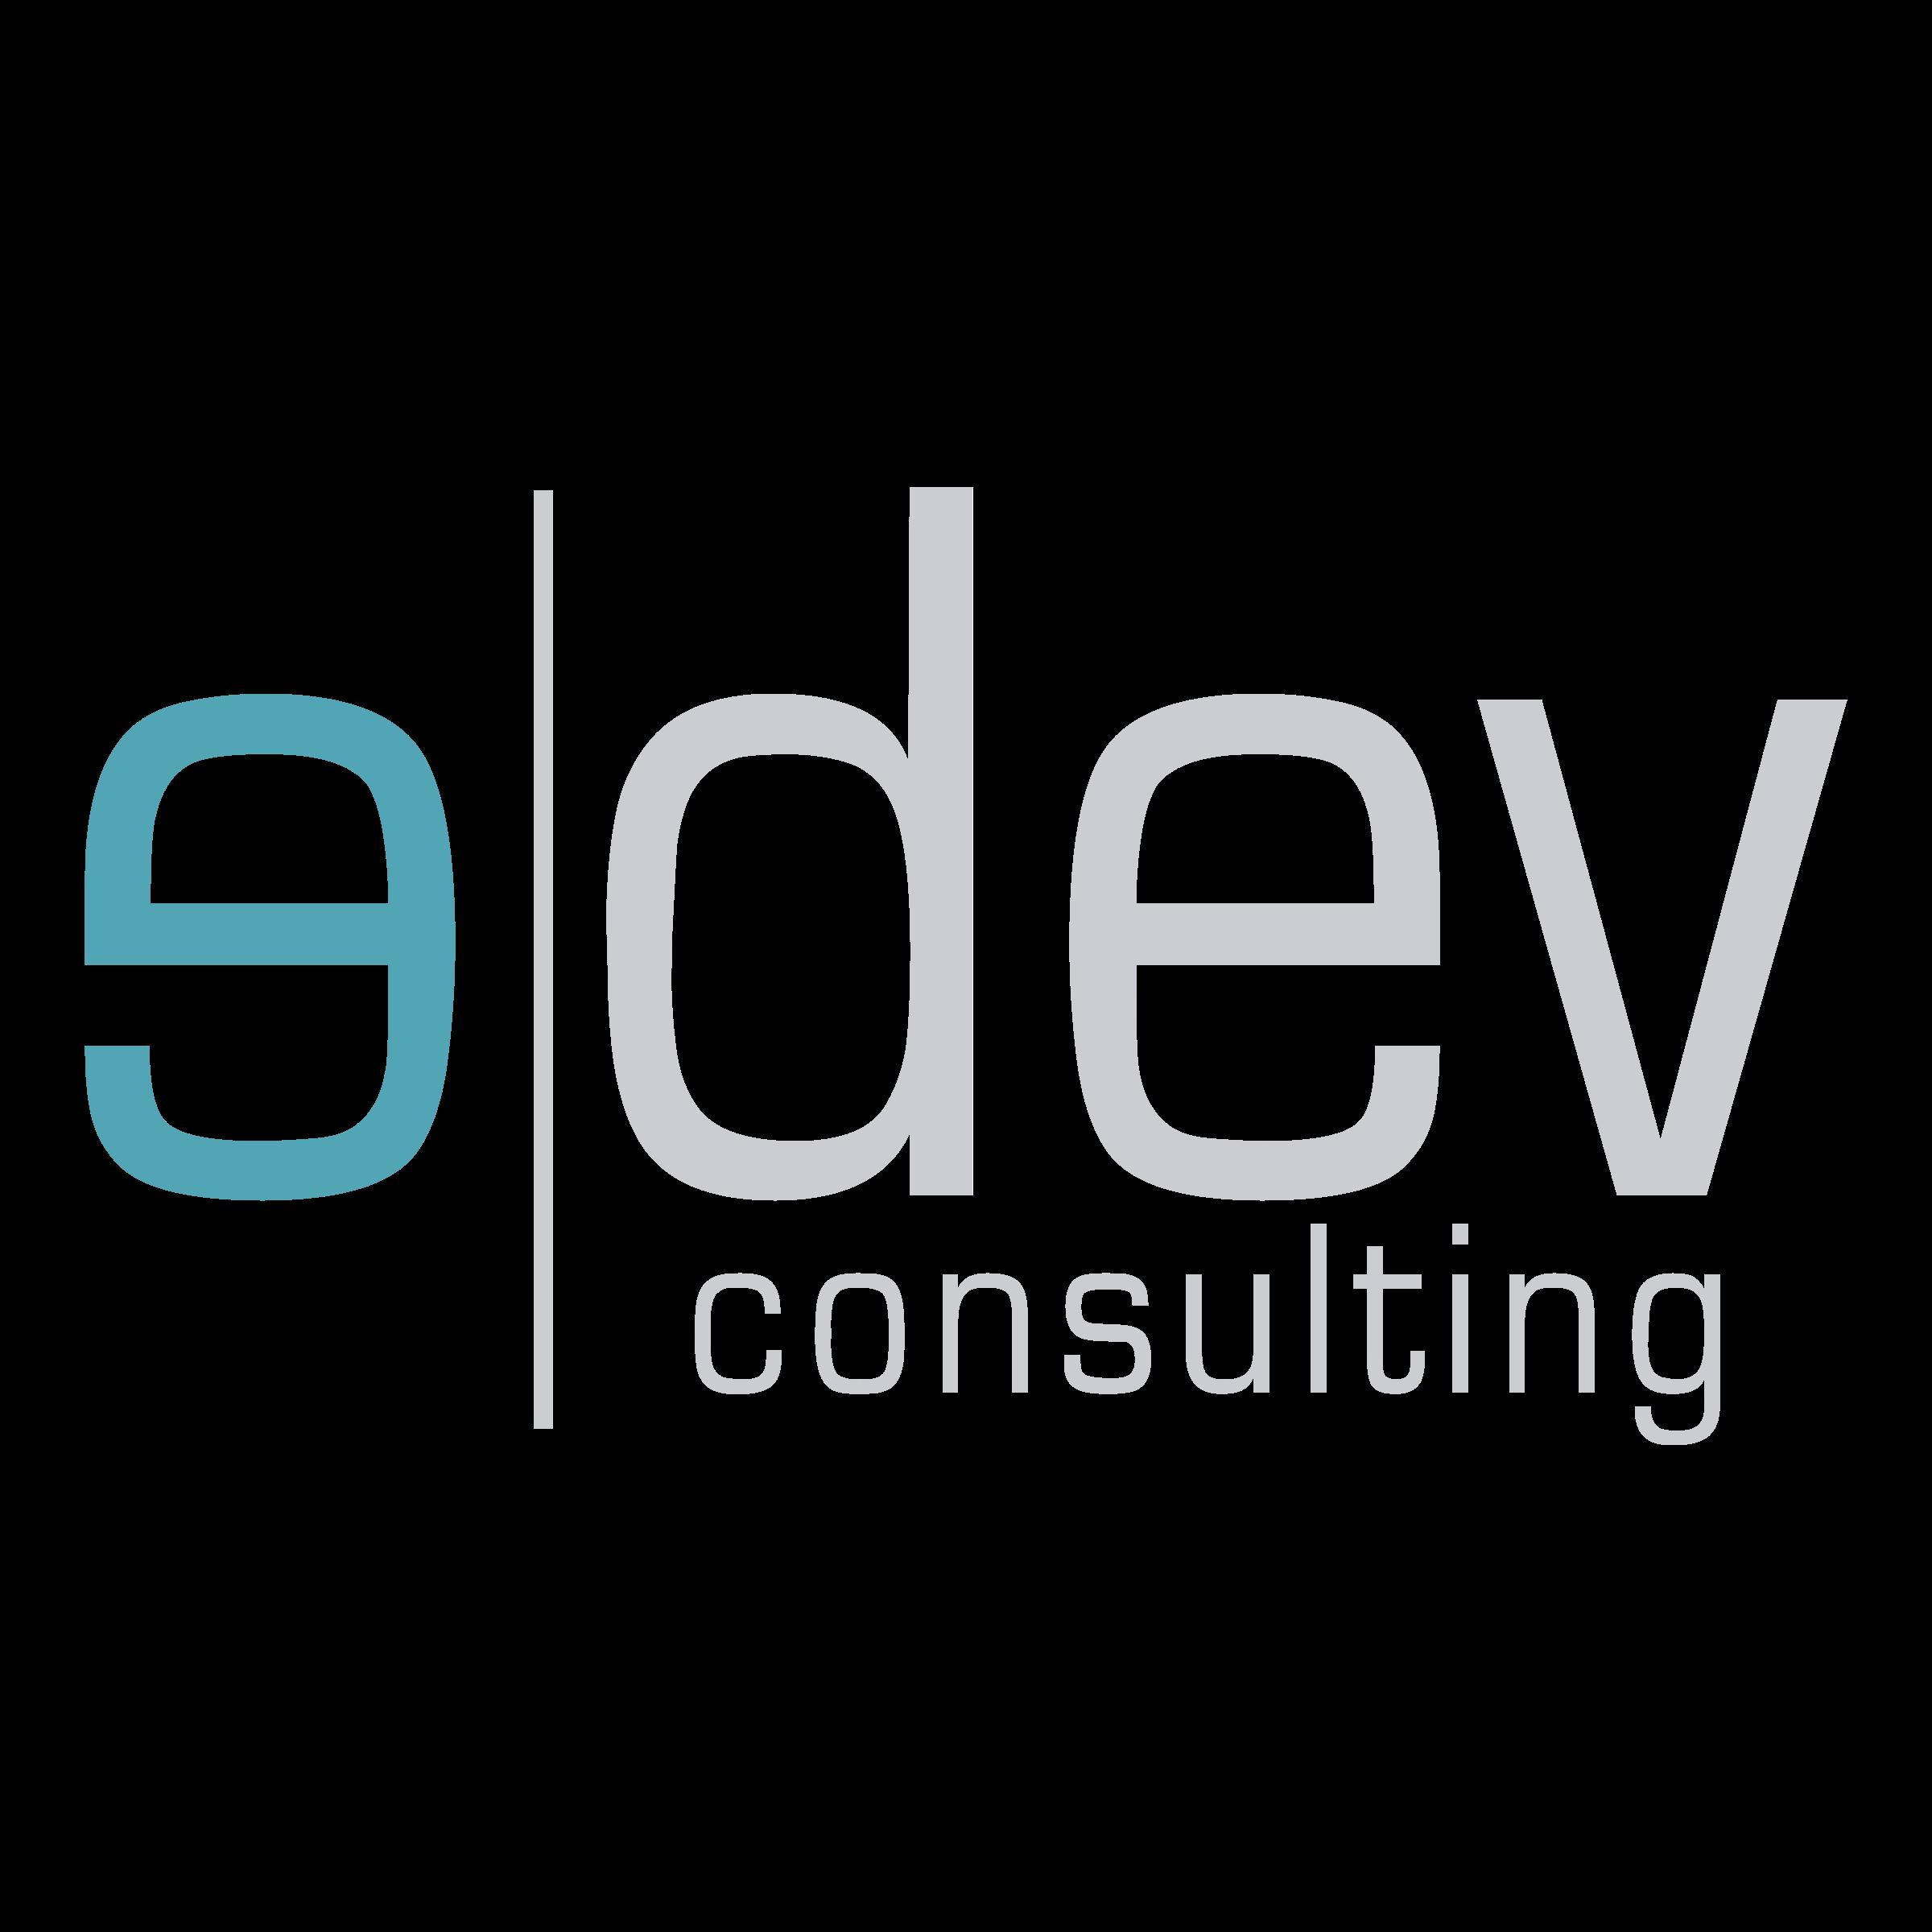 image freeuse Edev png transparent svg. Vector consulting logo